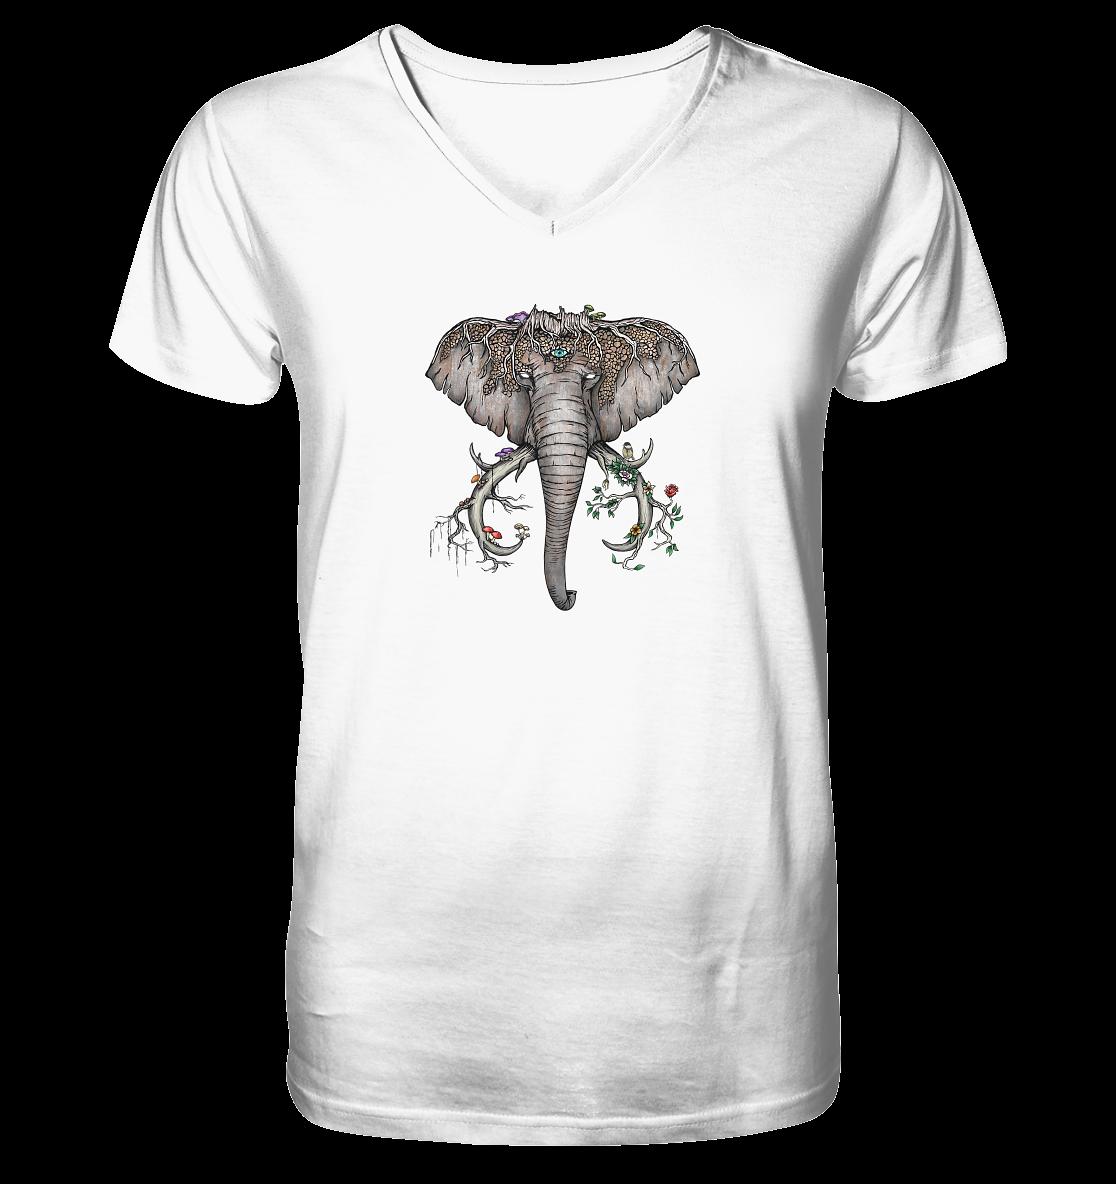 front-mens-organic-v-neck-shirt-f8f8f8-1116x-1.png